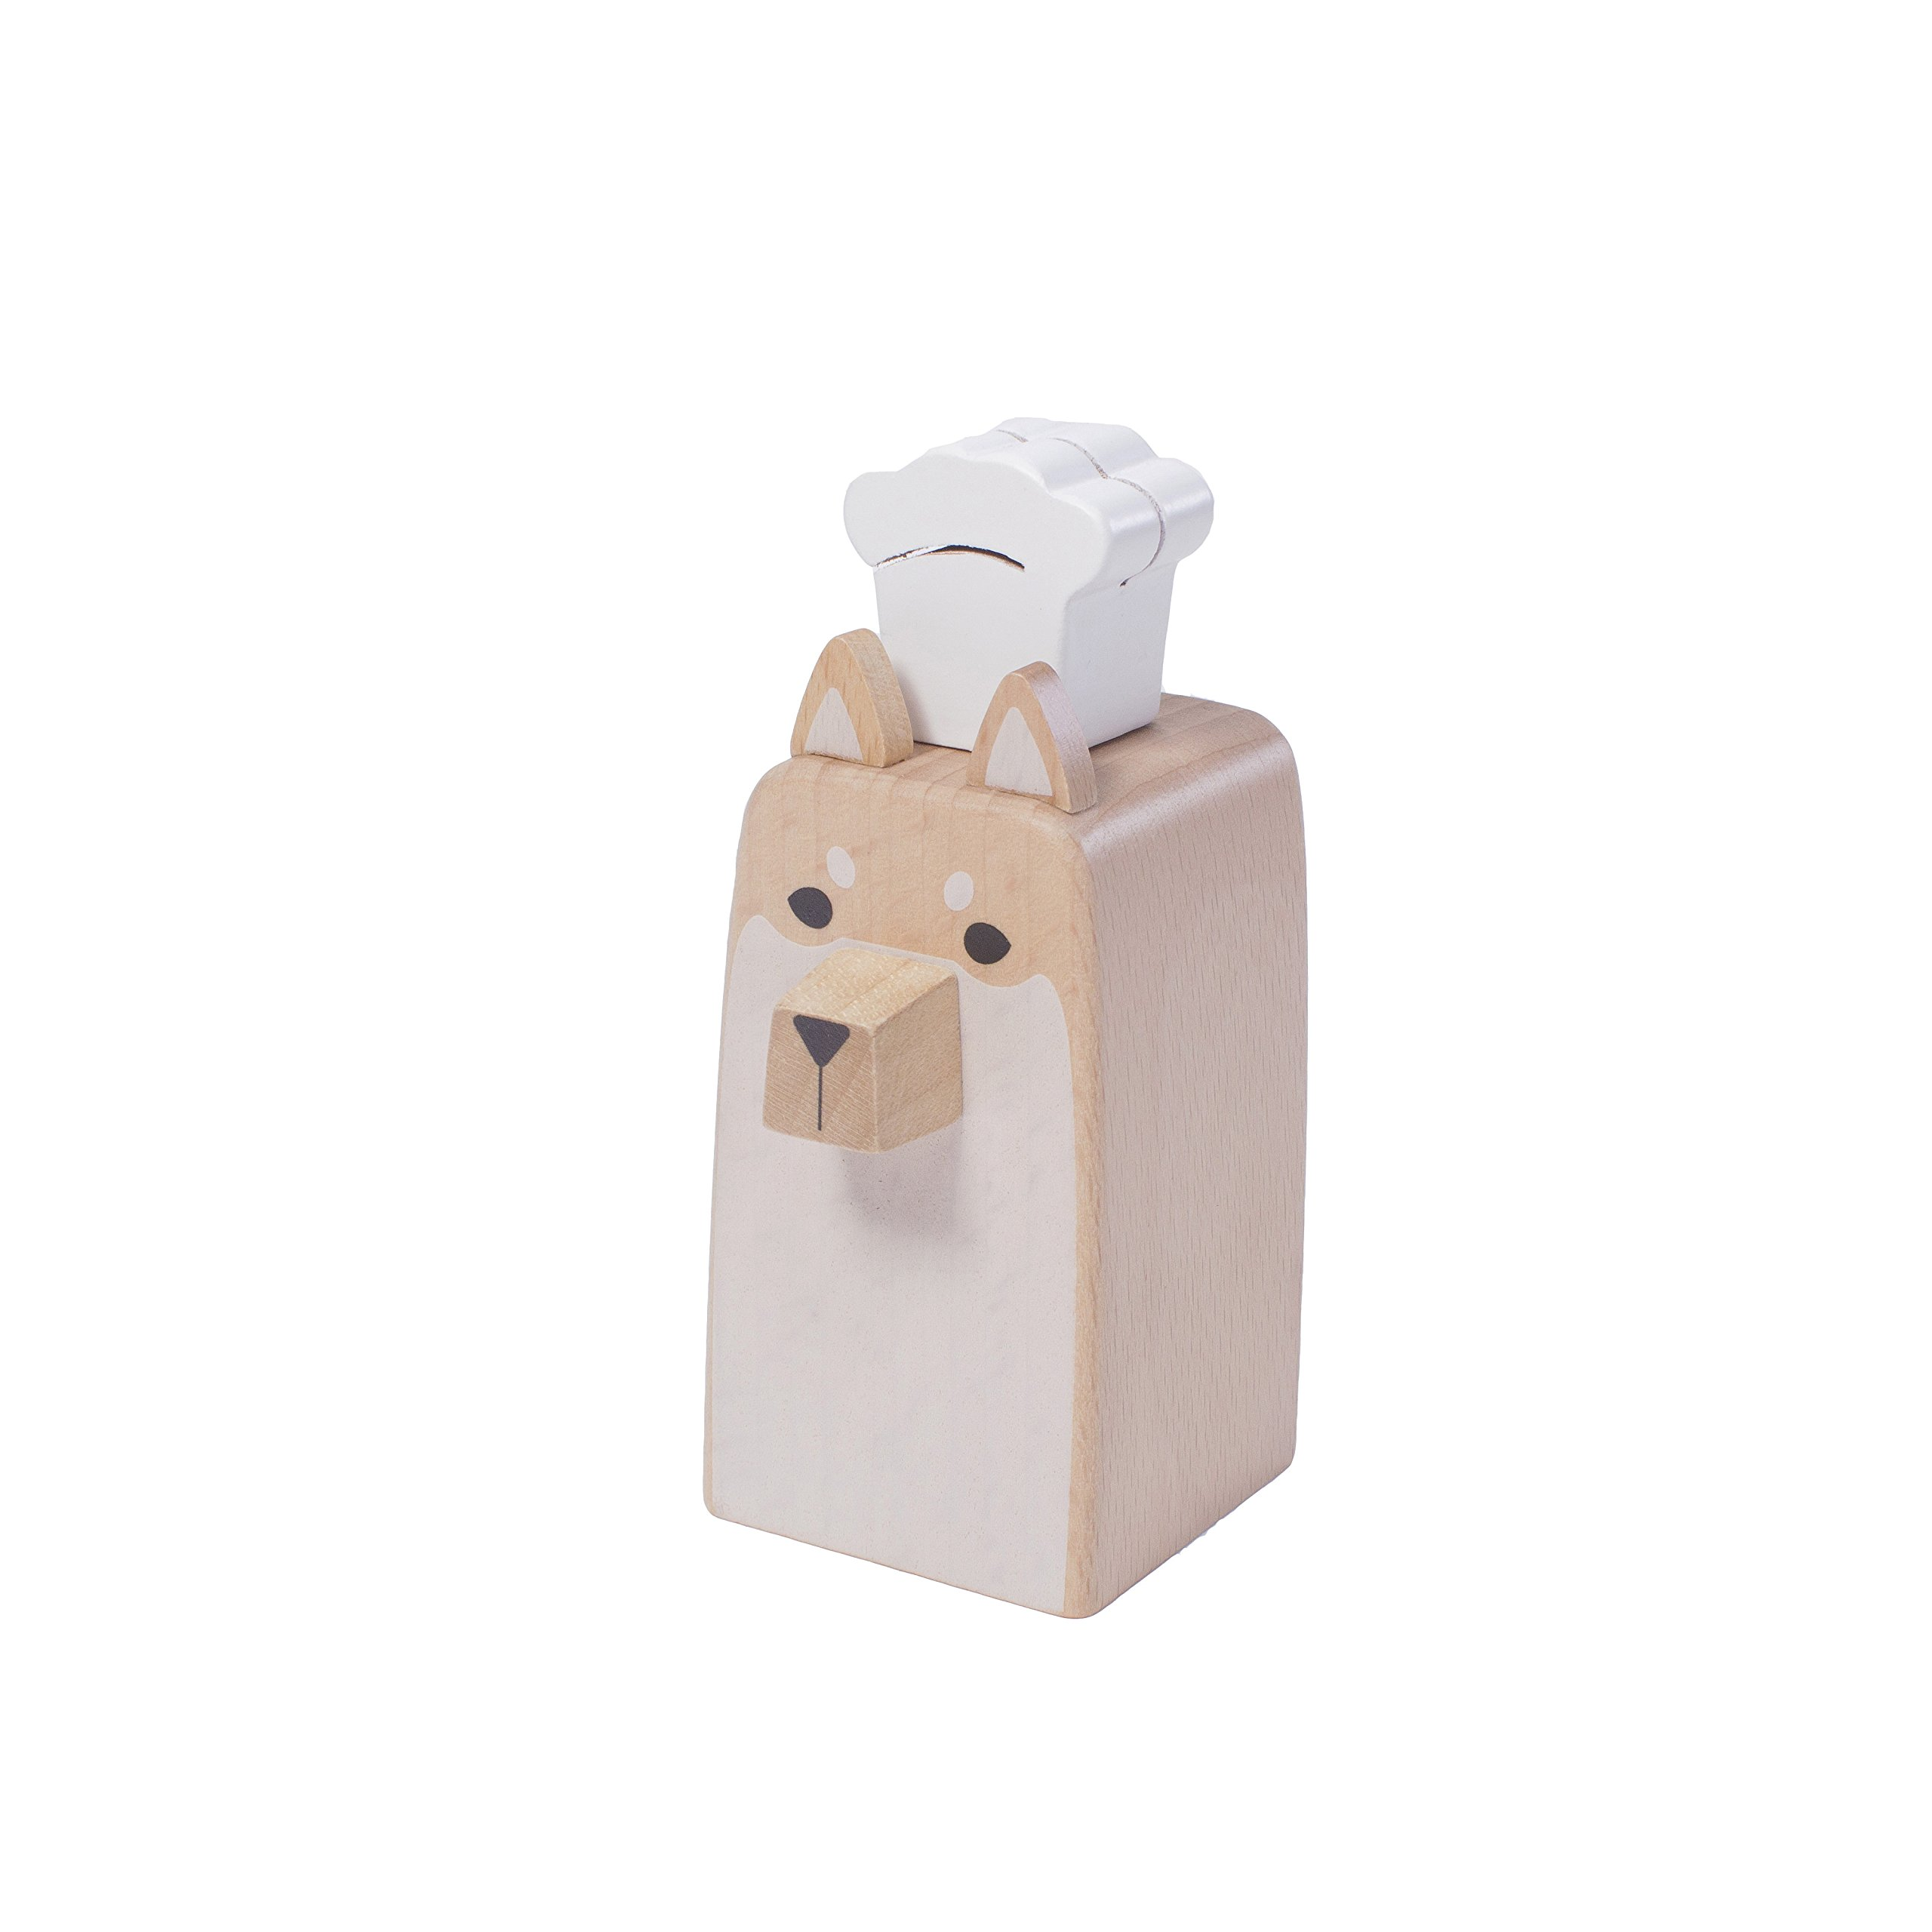 Faithful Dog designed Cruet -SHIBAINU